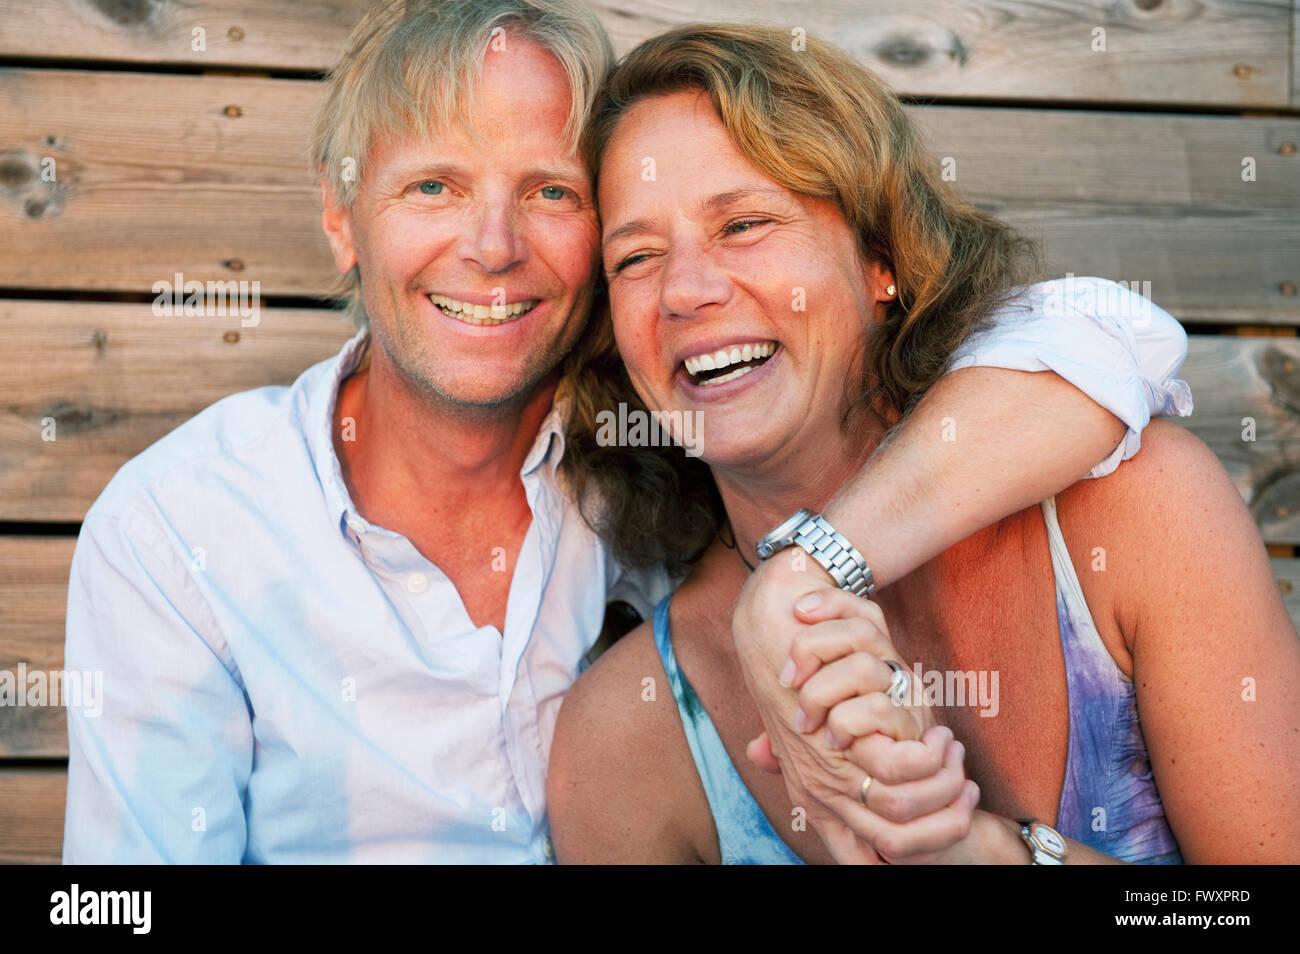 Sweden, Stockholm, Sodermanland, Dalaro, Portrait of mature couple embracing - Stock Image